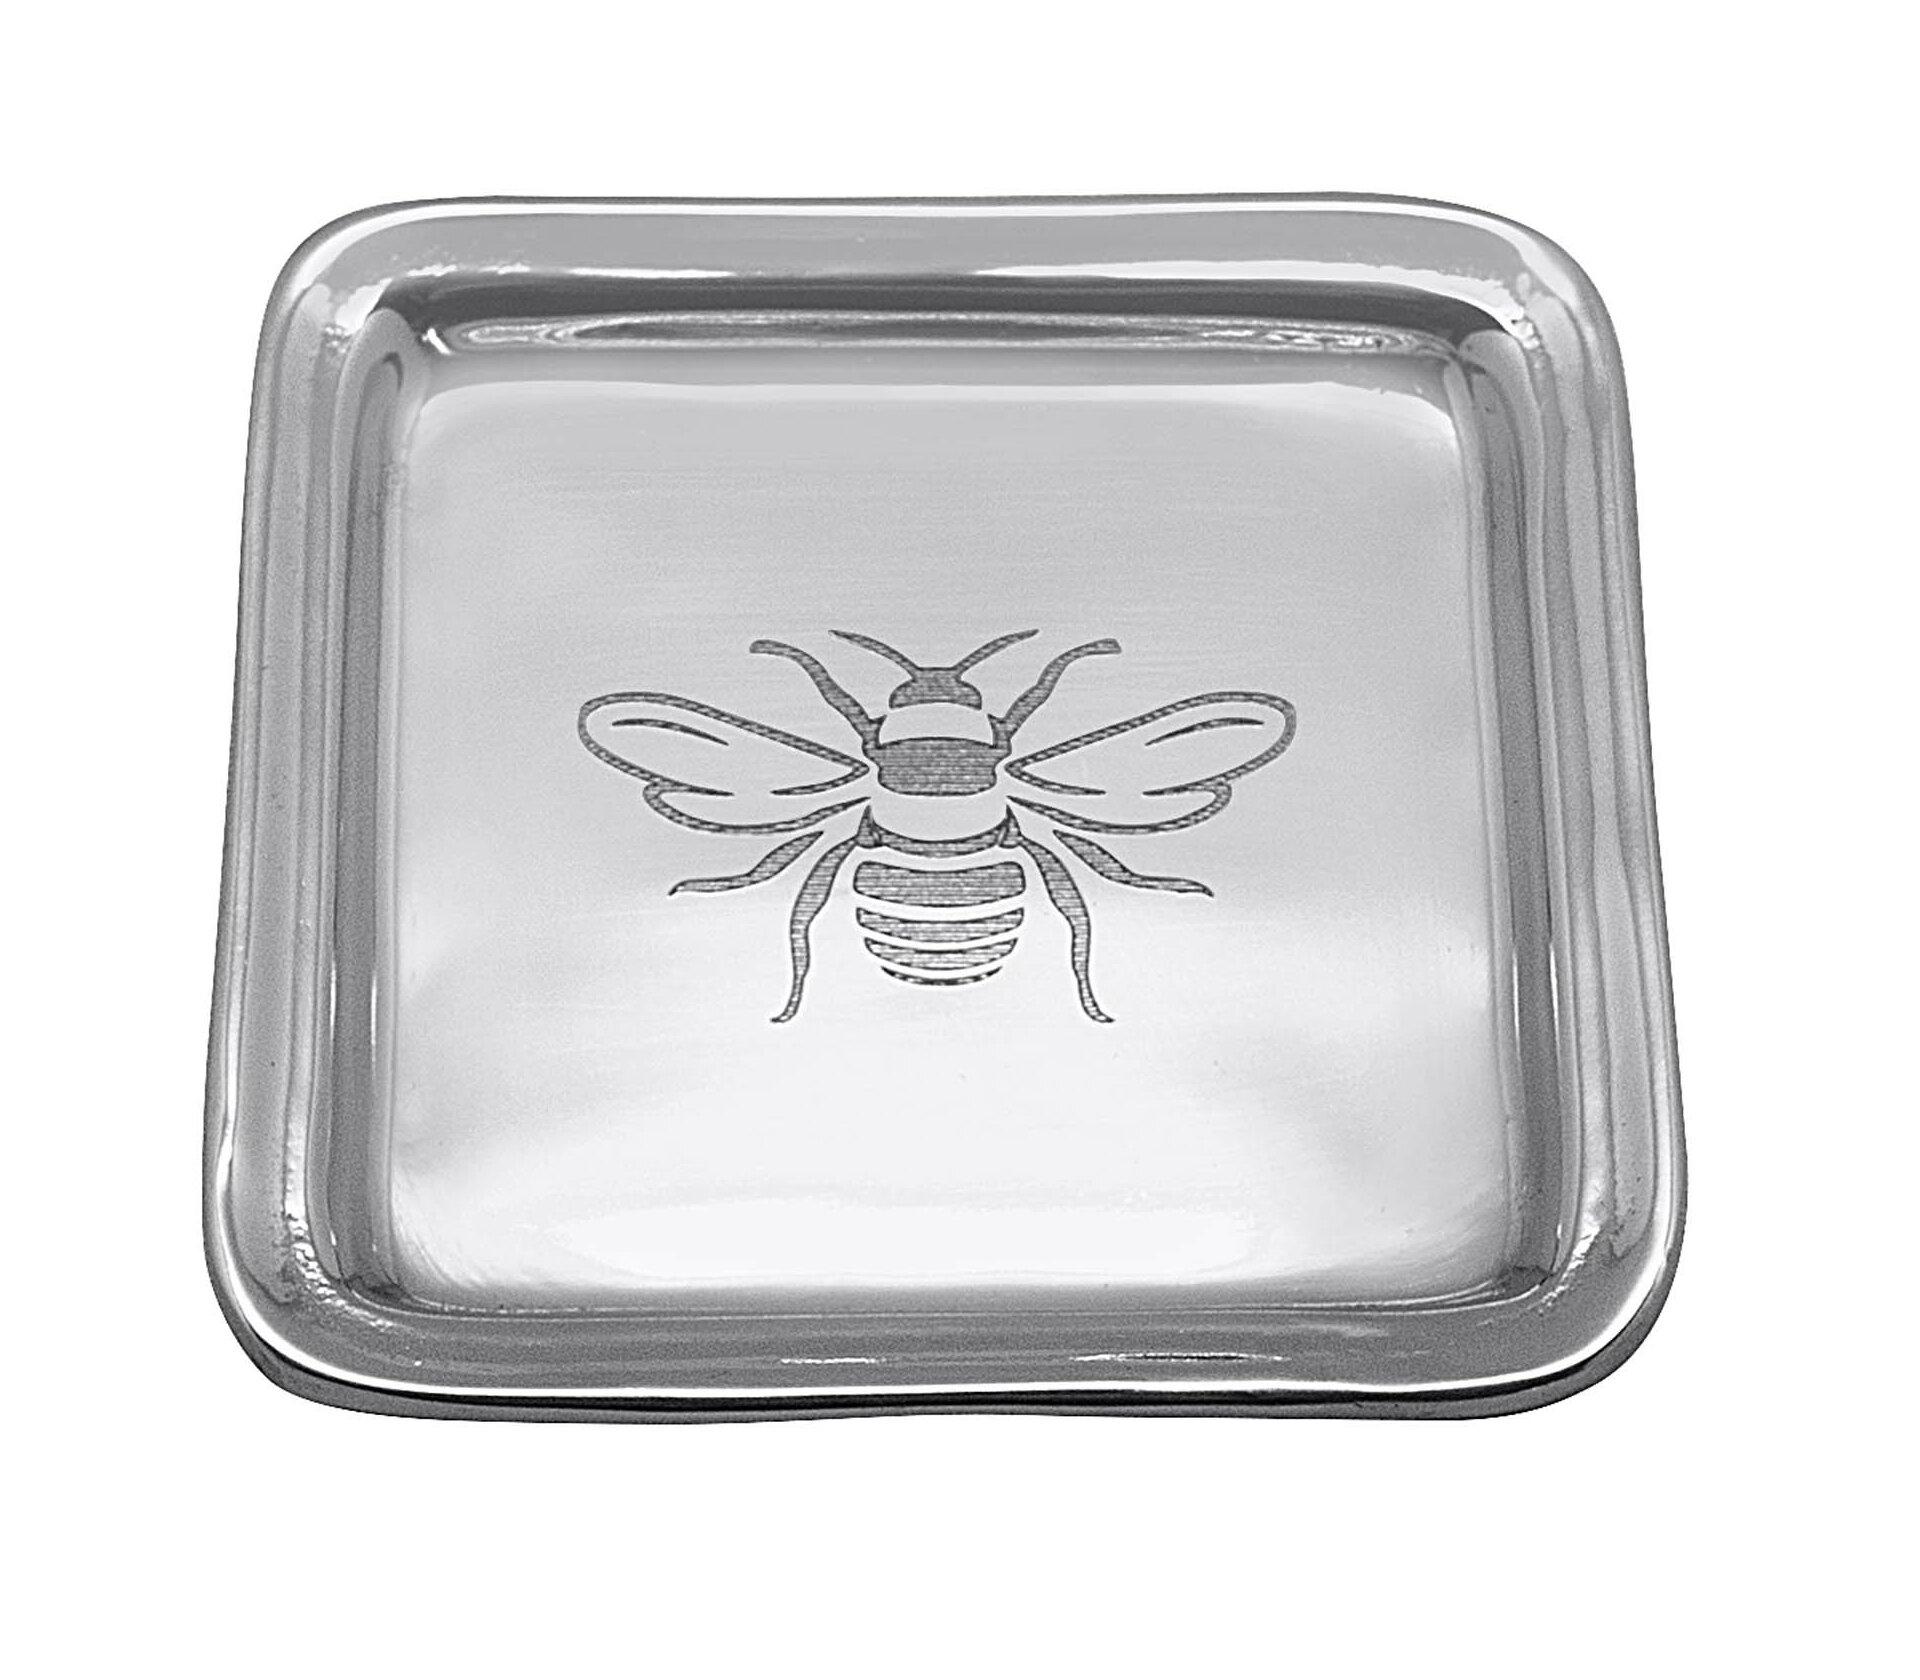 Mariposa Honey Bee Signature Post It Note Napkin Holder Wayfair